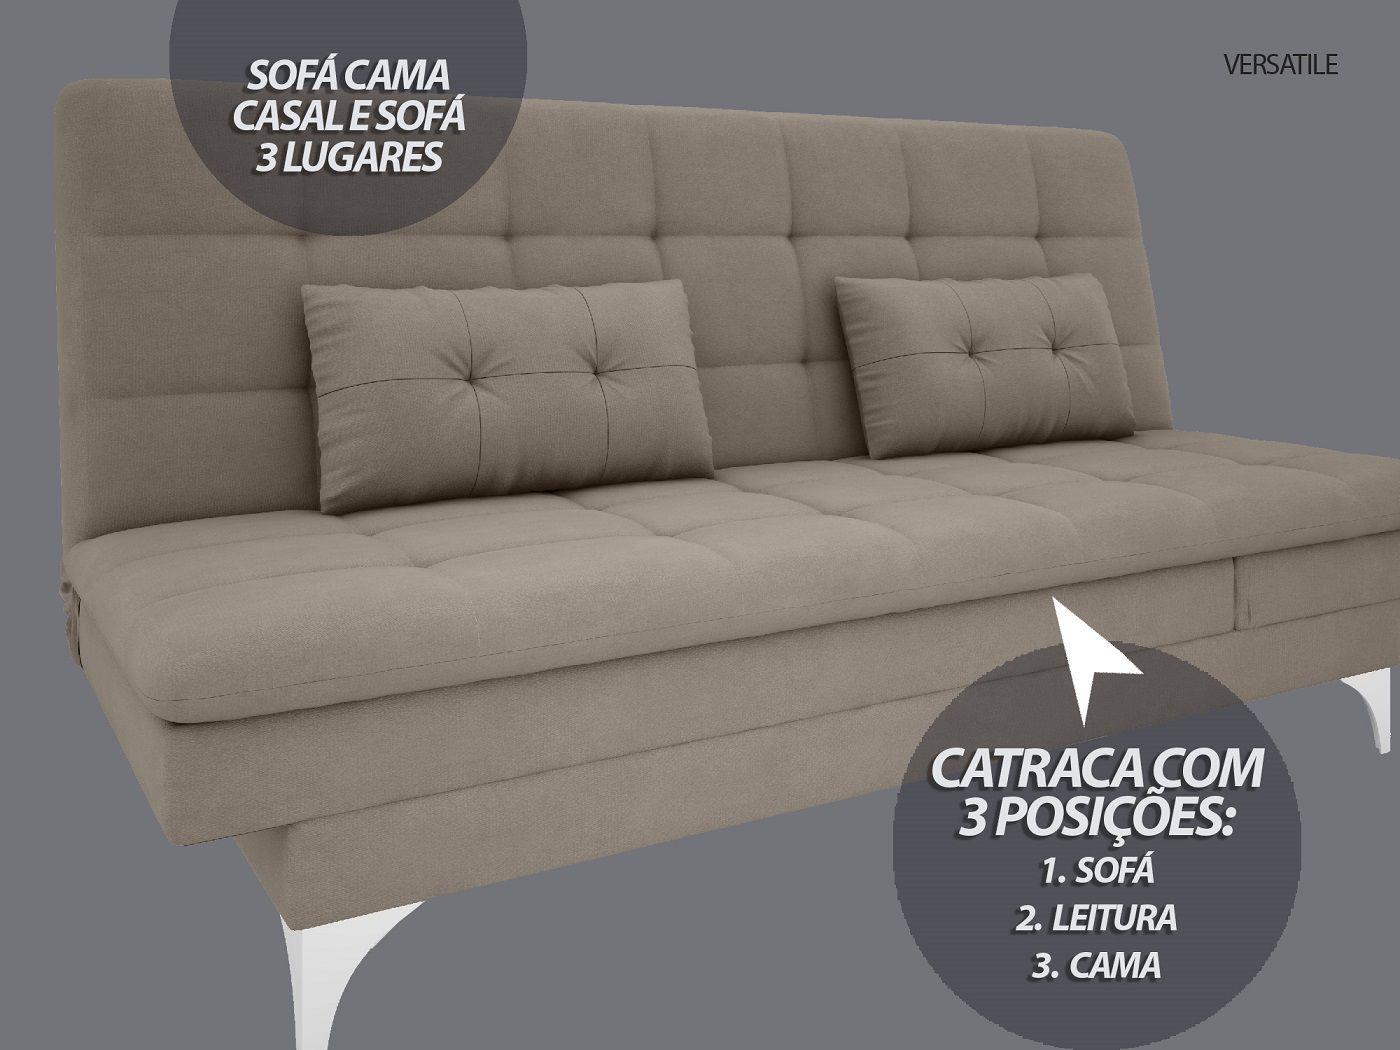 Sofá-Cama Casal New Versatile 1,94m Velosuede Bege - NETSOFAS  - NETSOFÁS